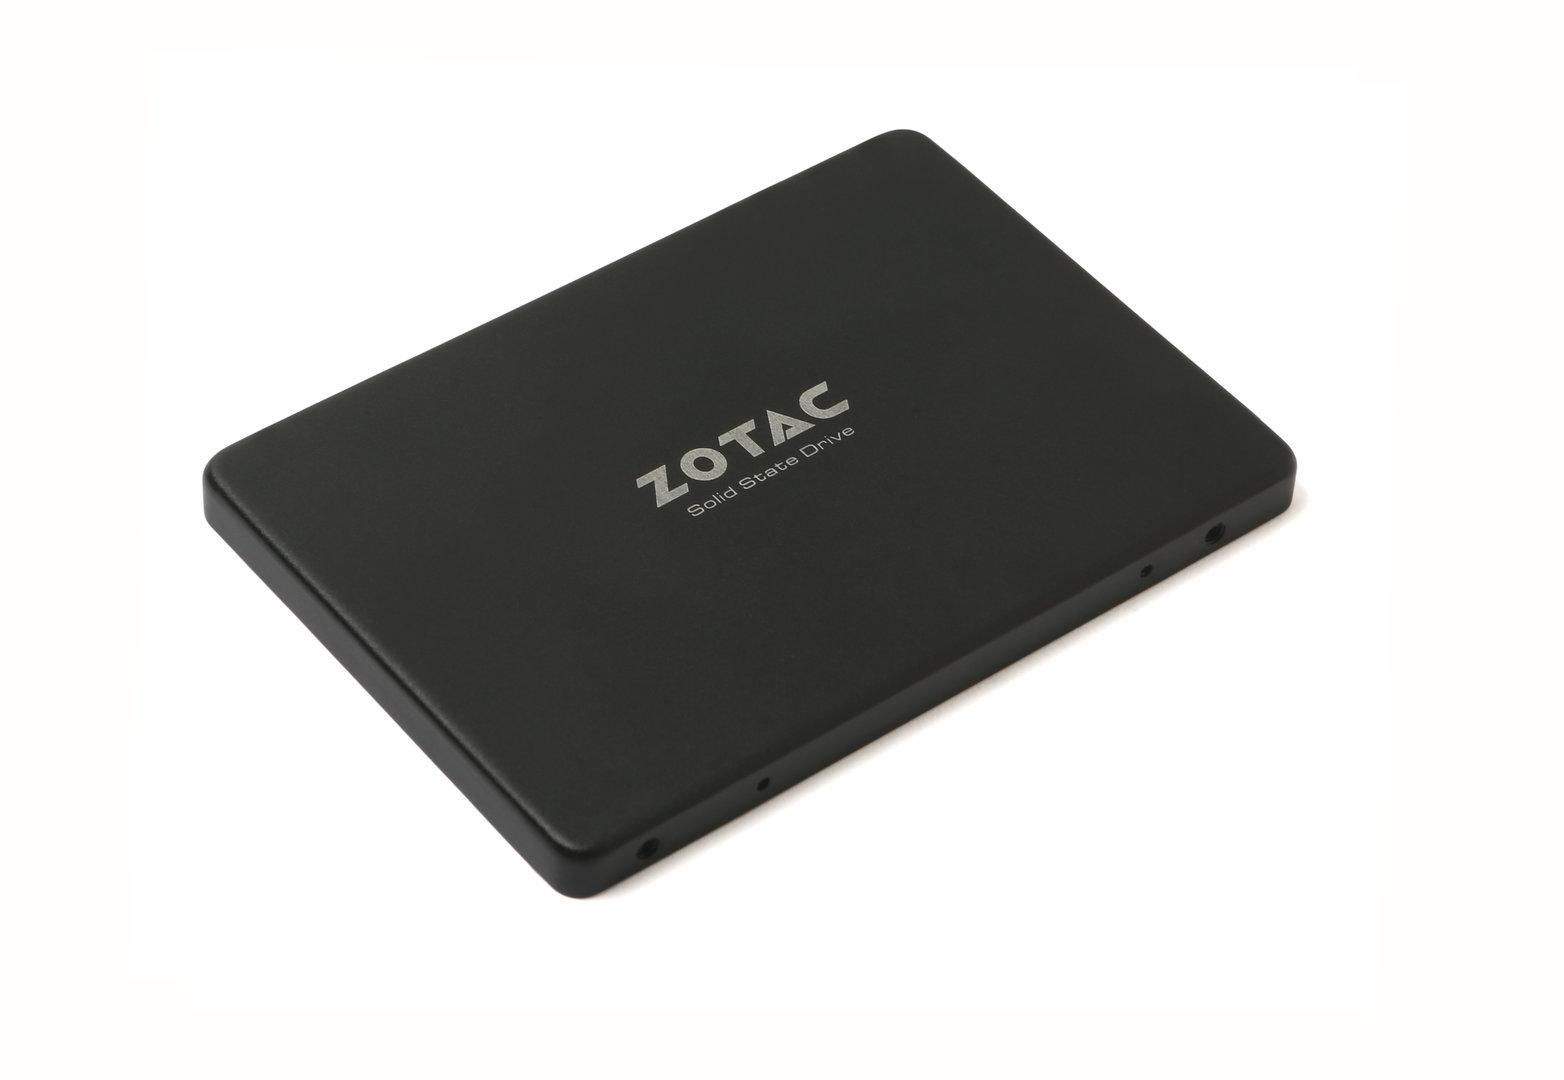 Zotac Premium SSD 480 GB